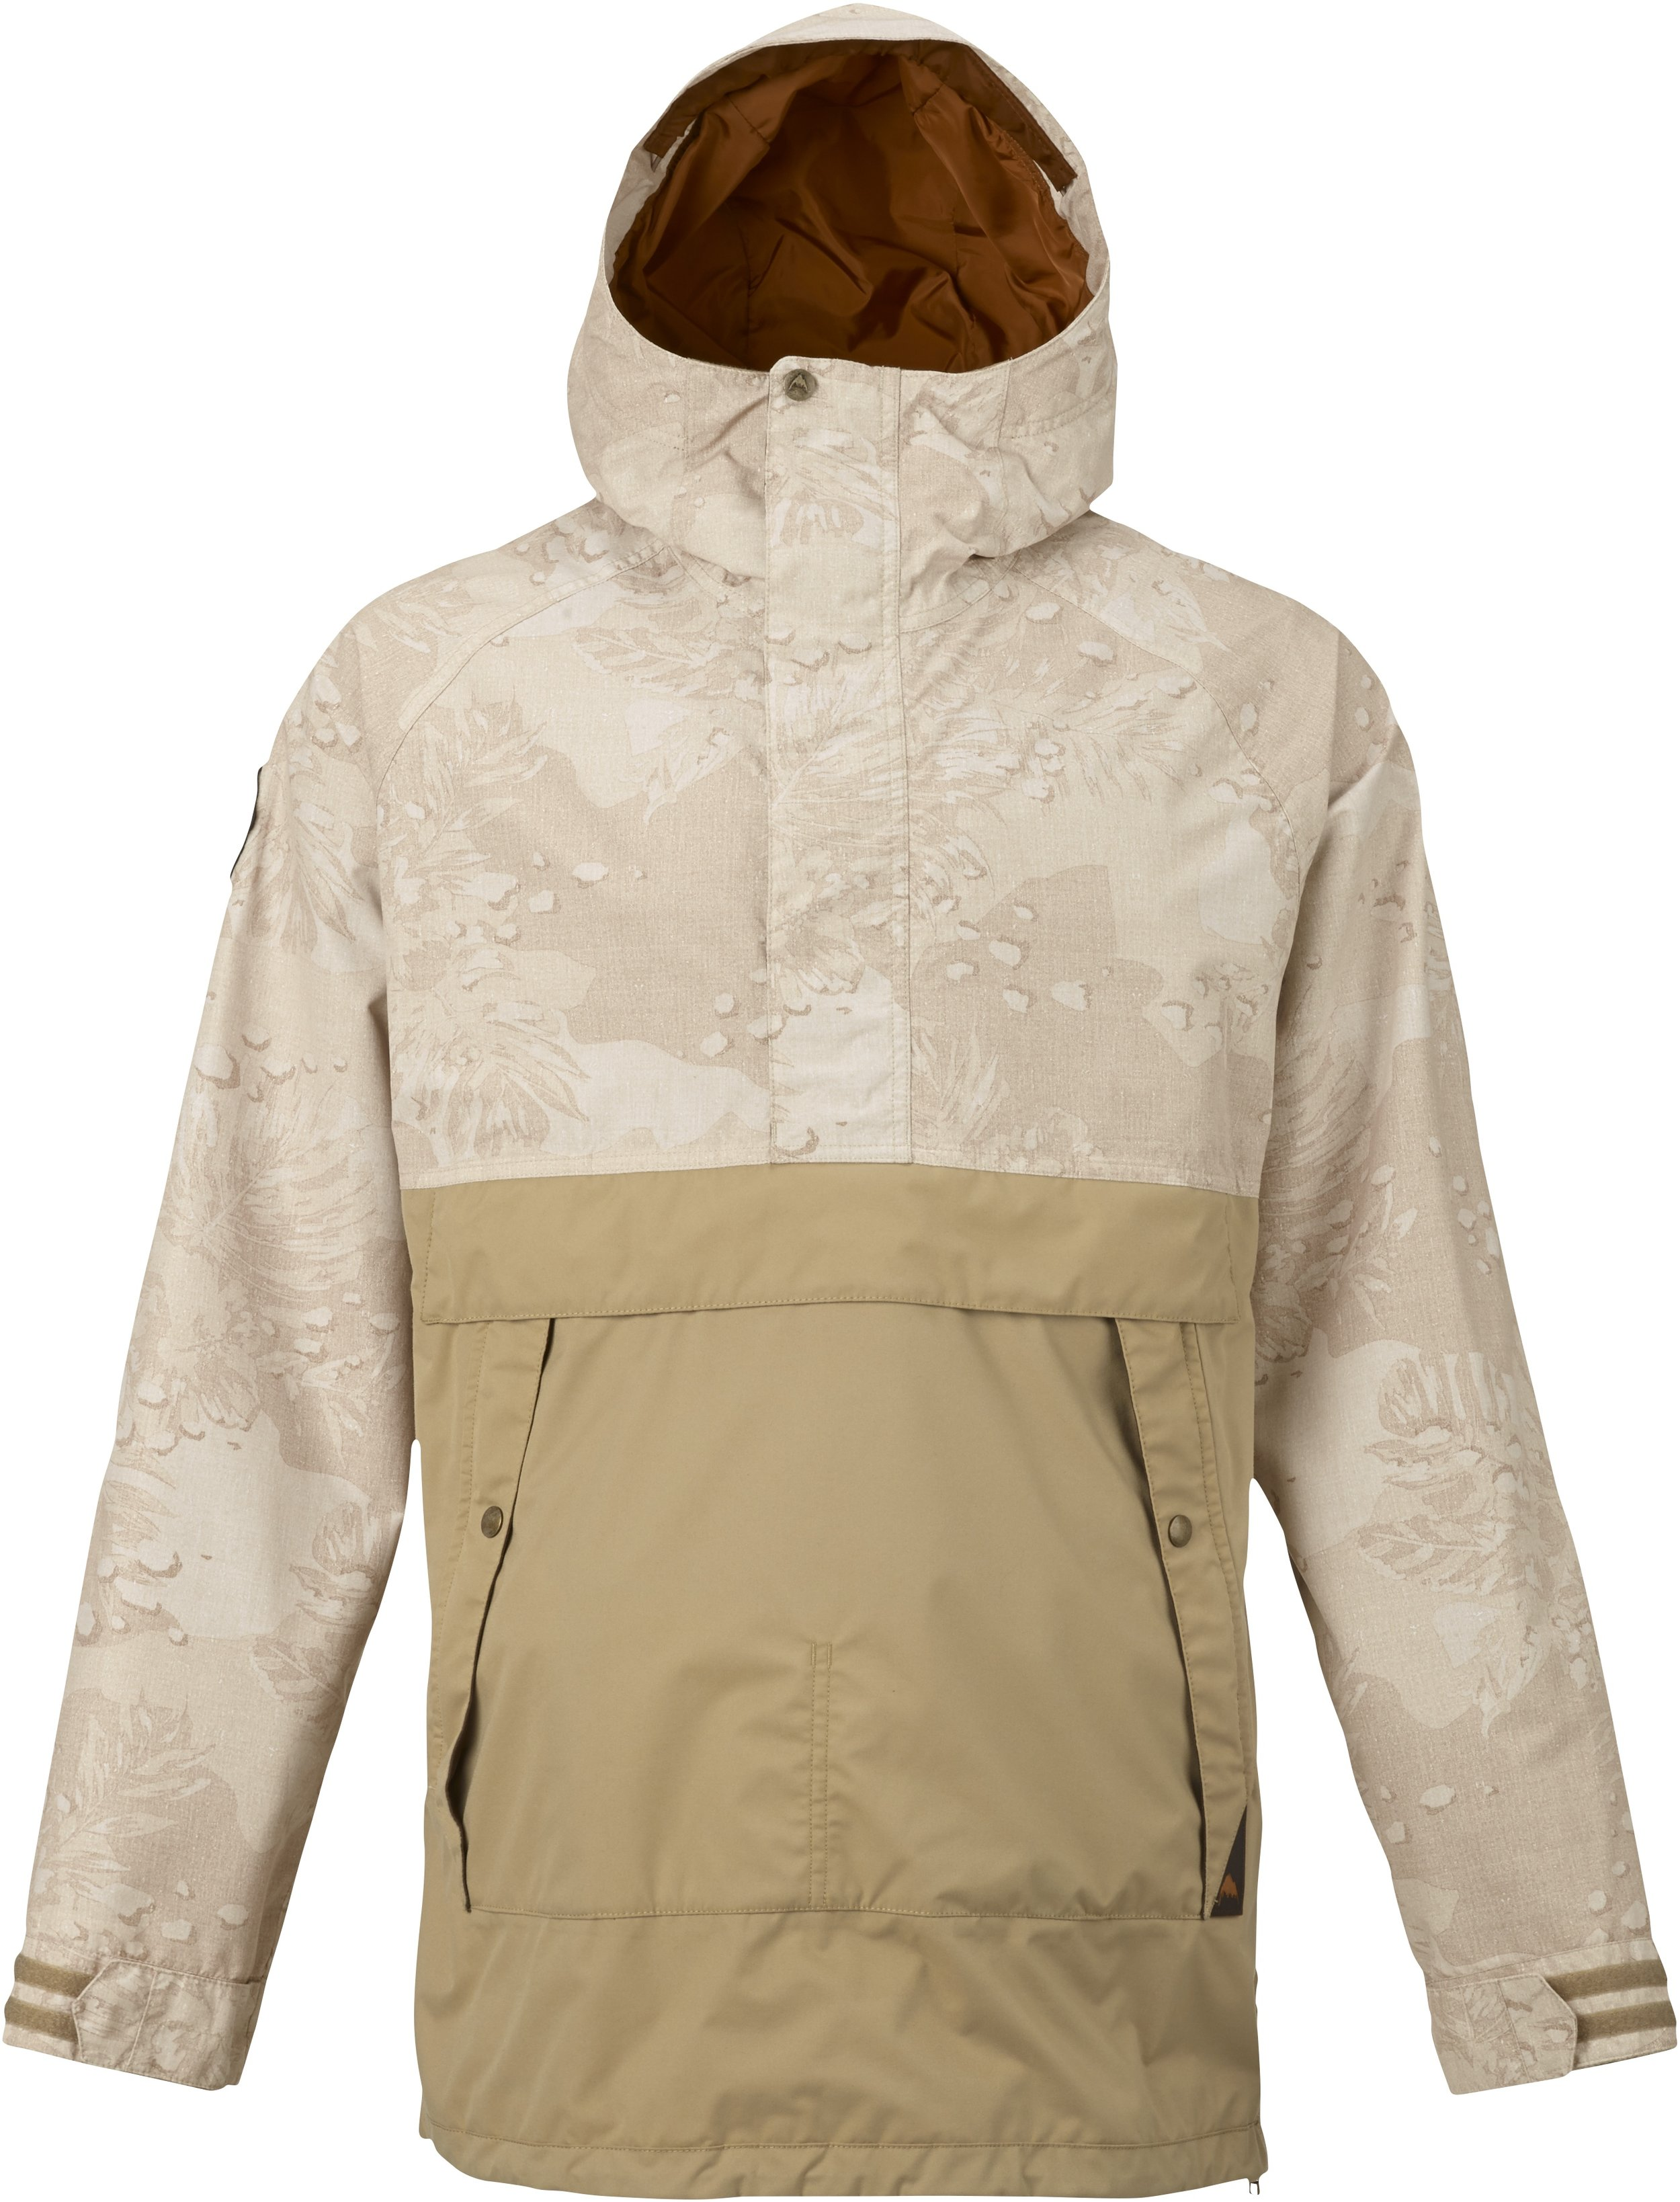 Burton Rambler Anorak Jacket at Amazon Fashion, $219.95